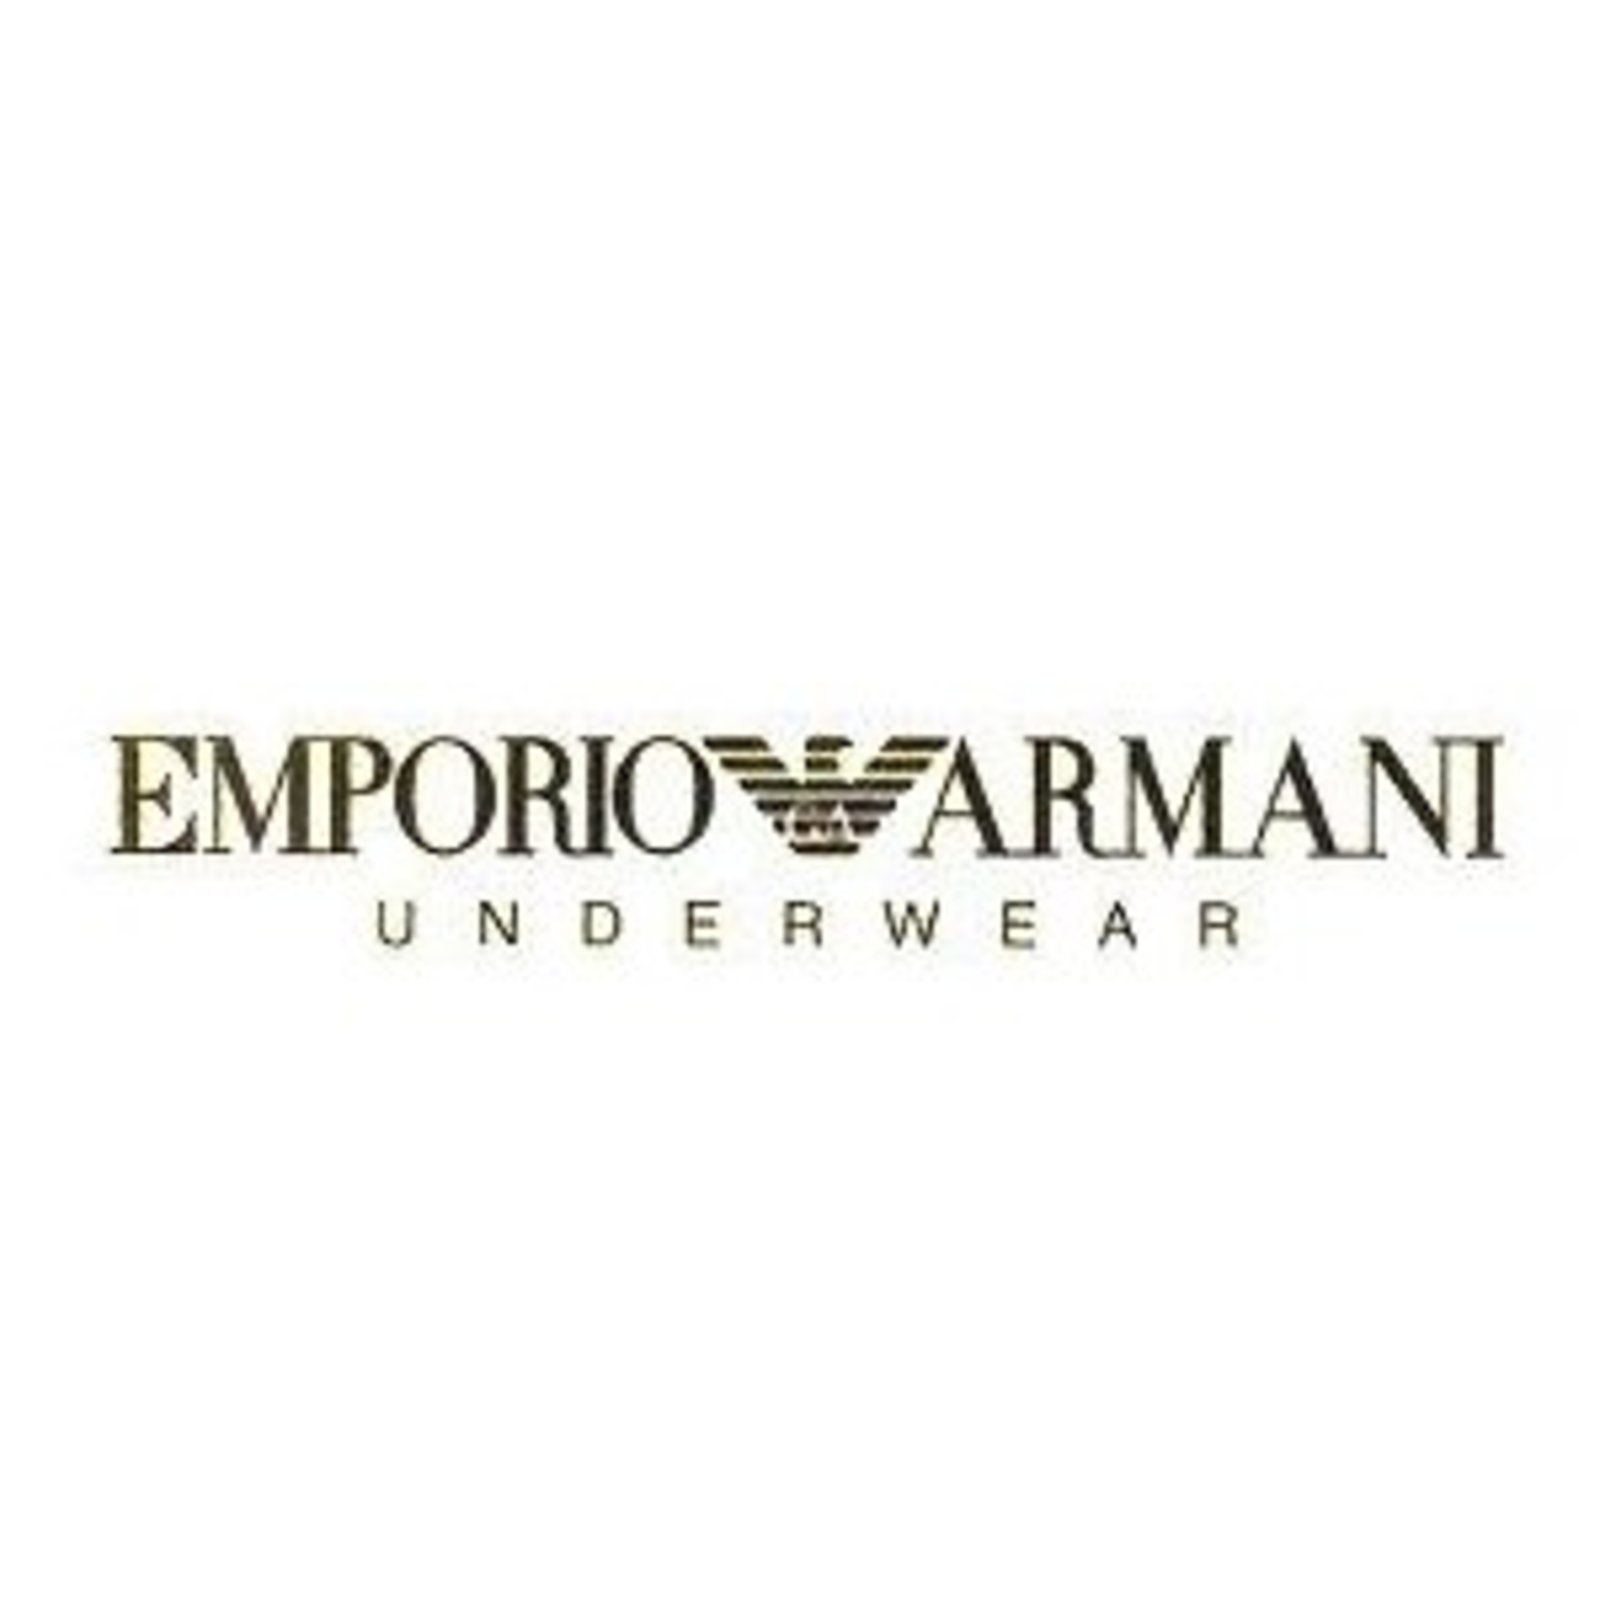 Under wear emporio armani boxer shorts at togged clothing - Emporio giorgio armani logo ...